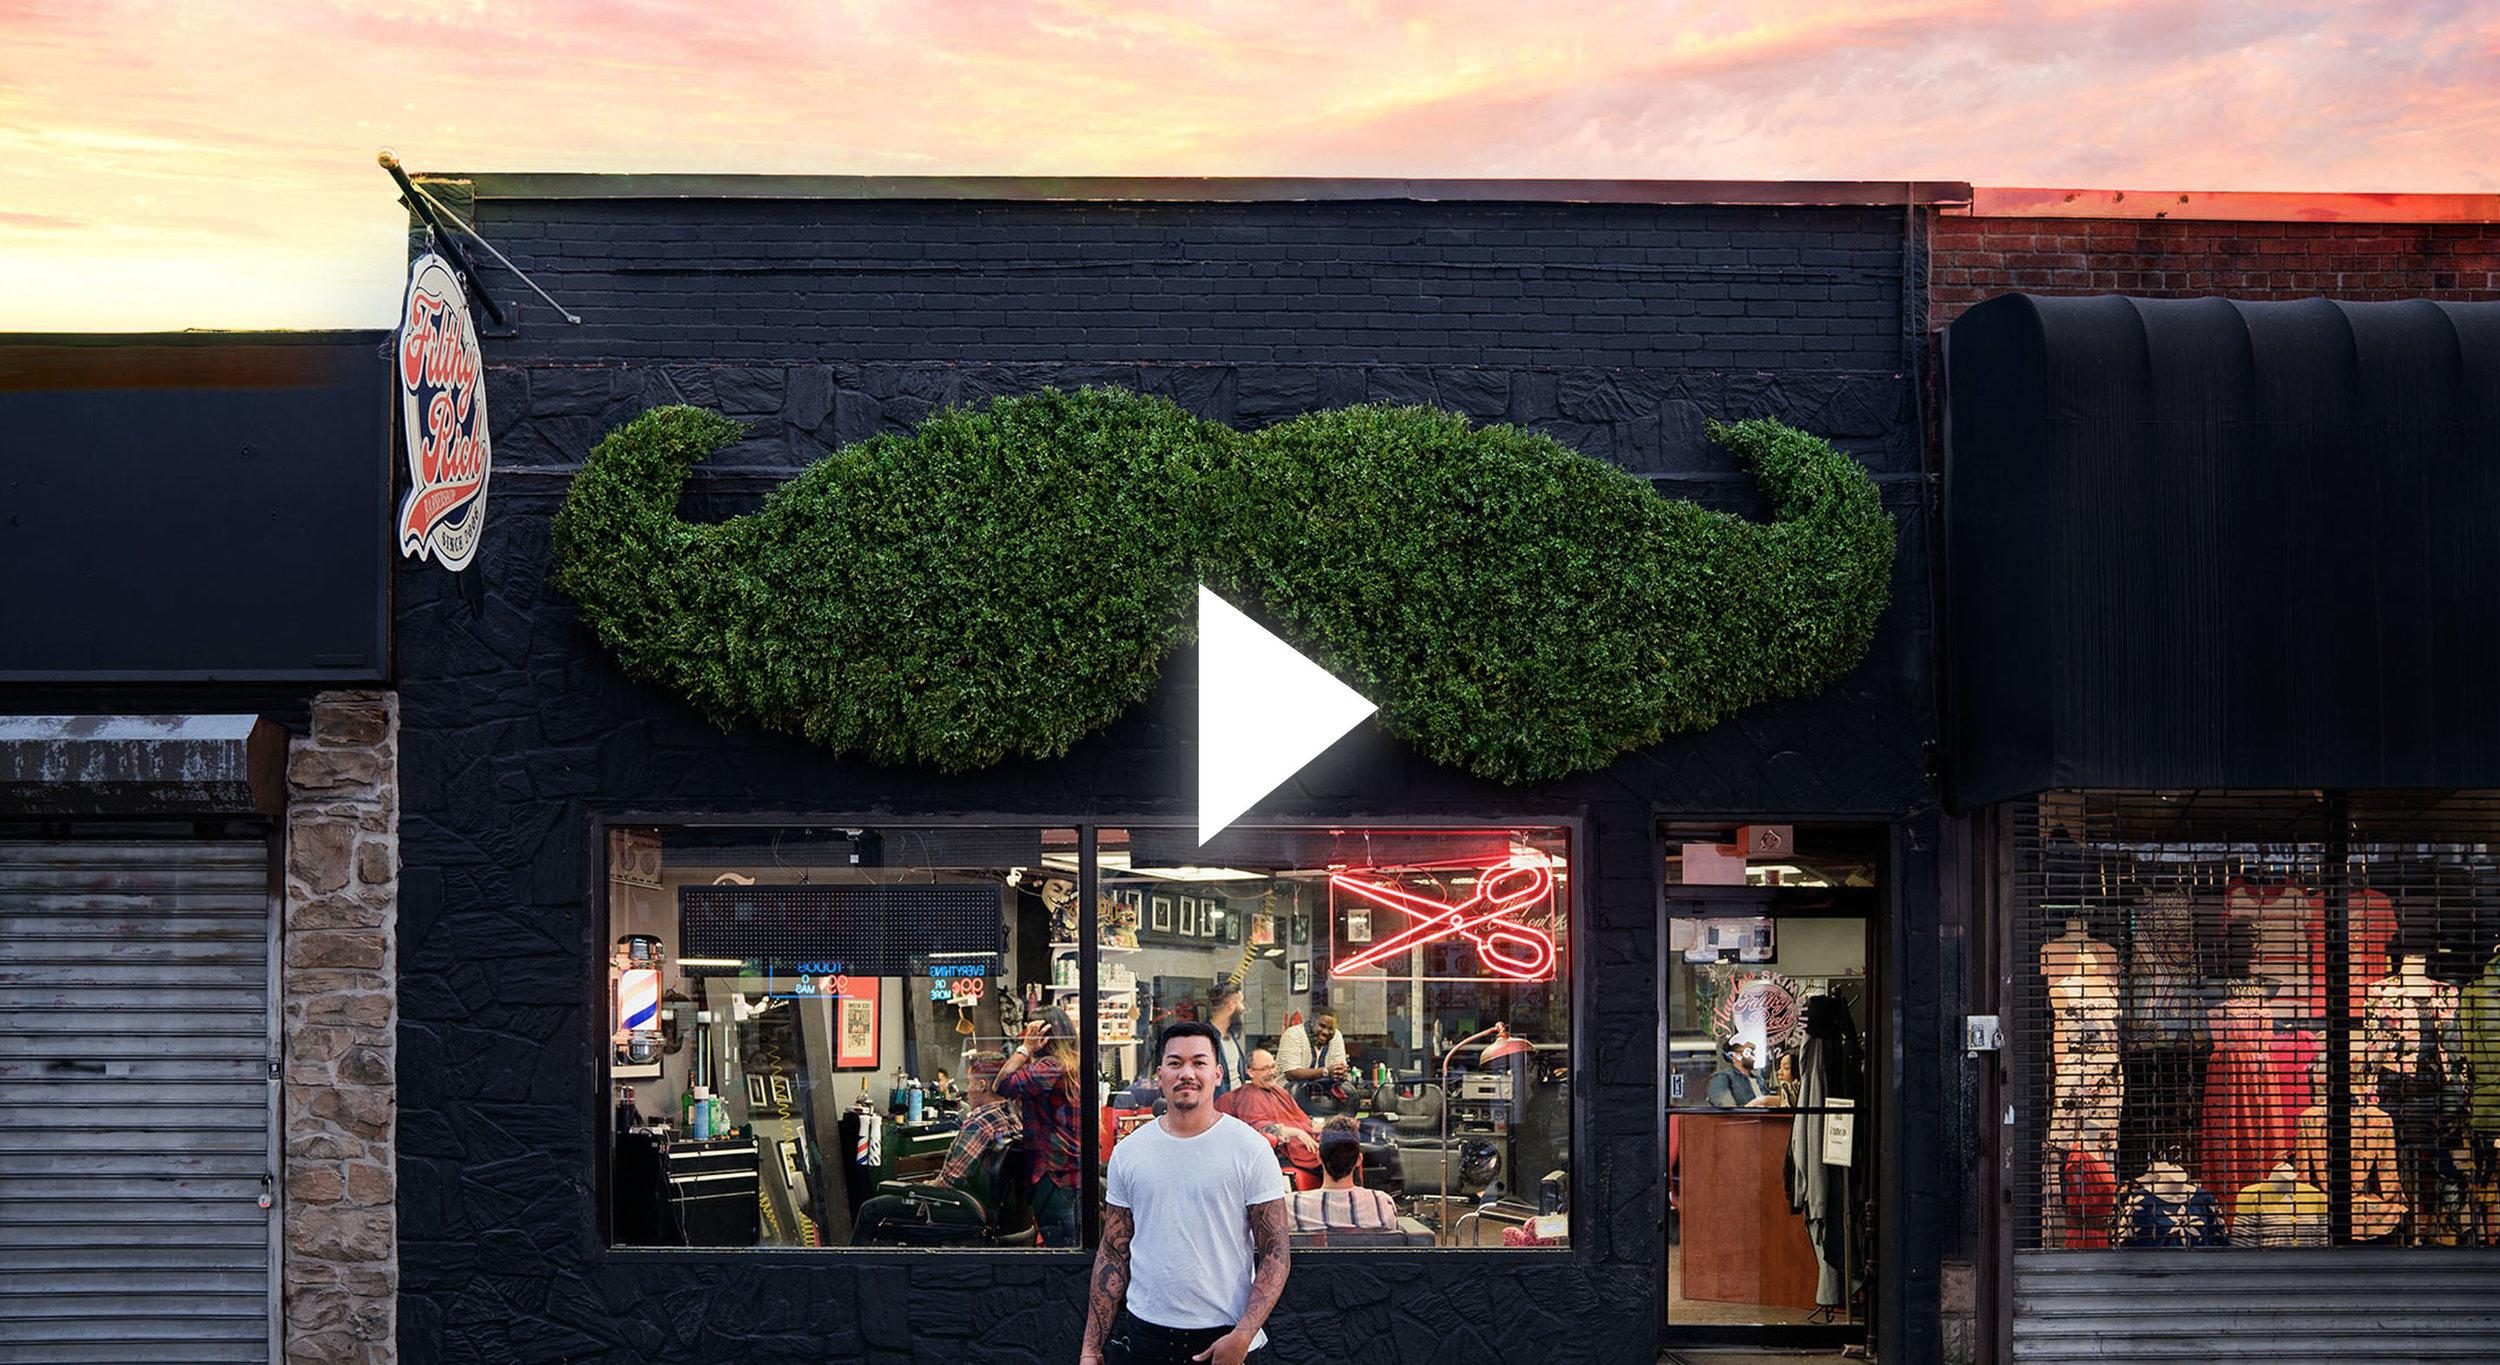 Chase INk barbershop thumbnail.jpg